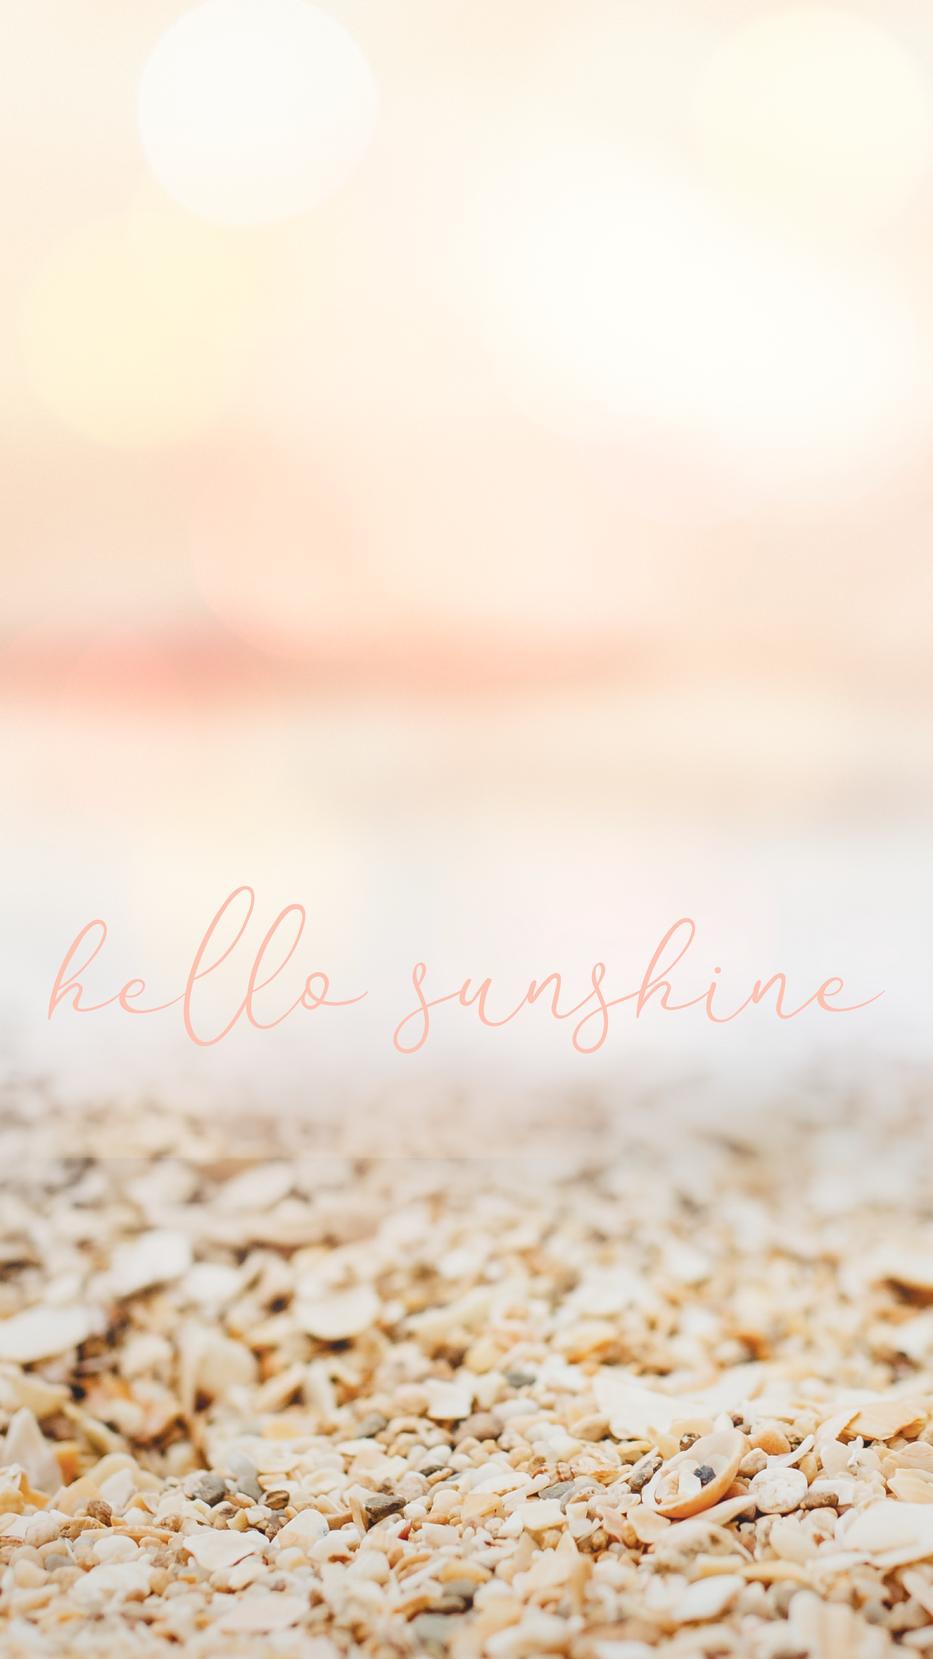 Hello Sunshine Mobile Background